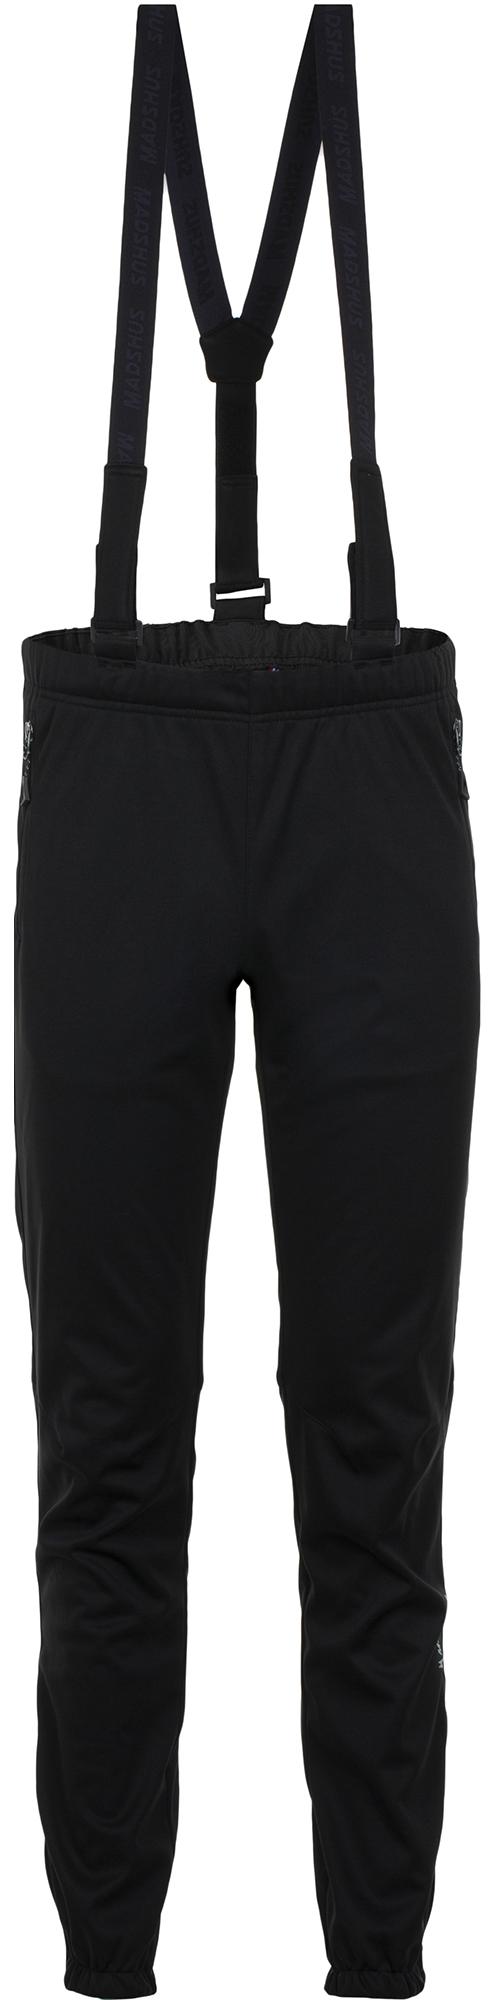 Madshus Брюки мужские Madshus, размер 56 брюки мужские oodji цвет темно синий 2b200024m 47530n 7900n размер 48 56 182